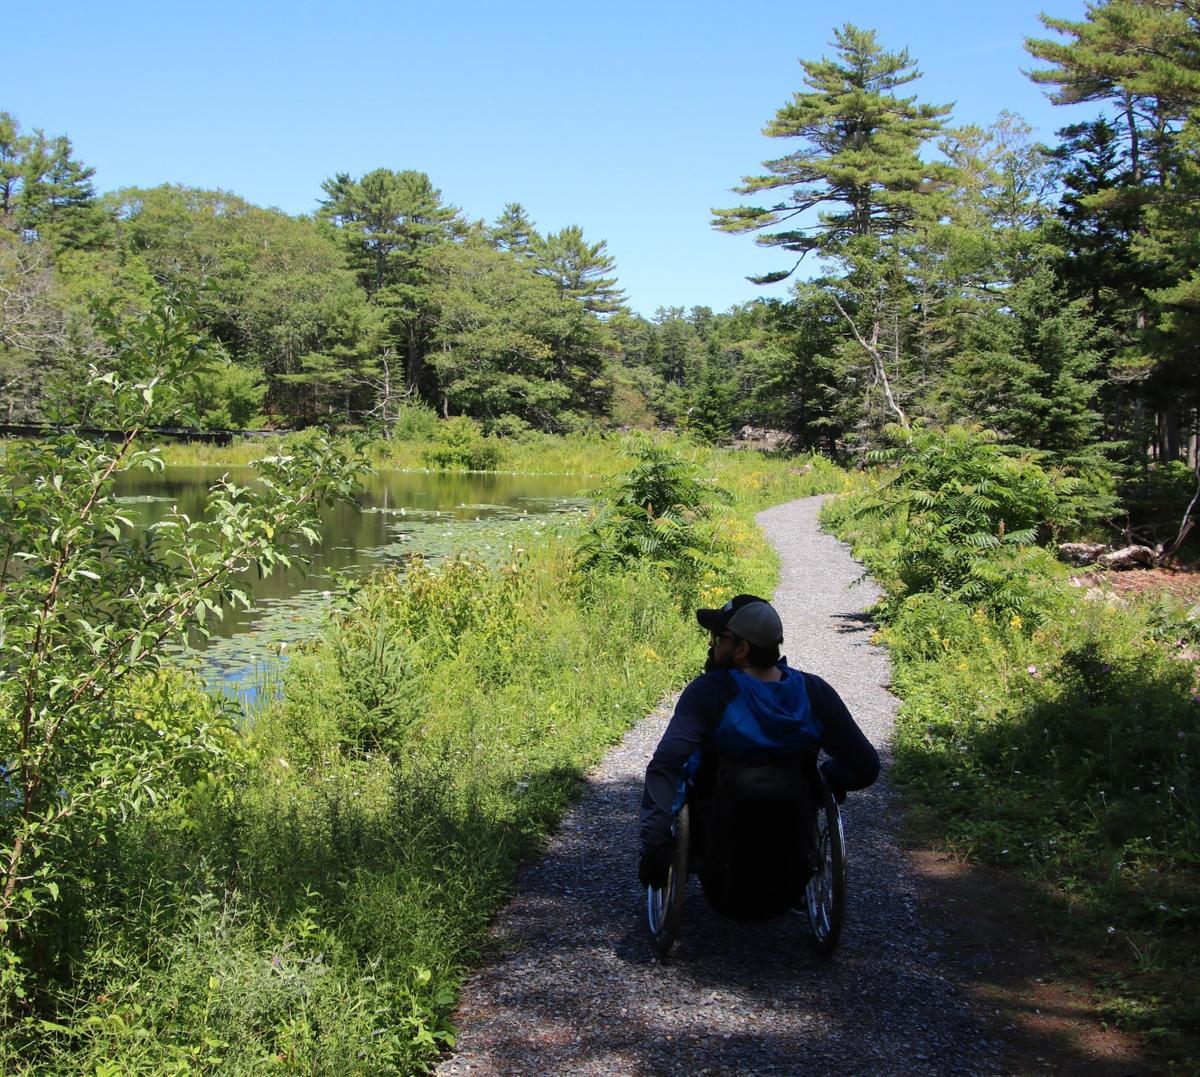 Enock enjoying the trails at Oak Point.